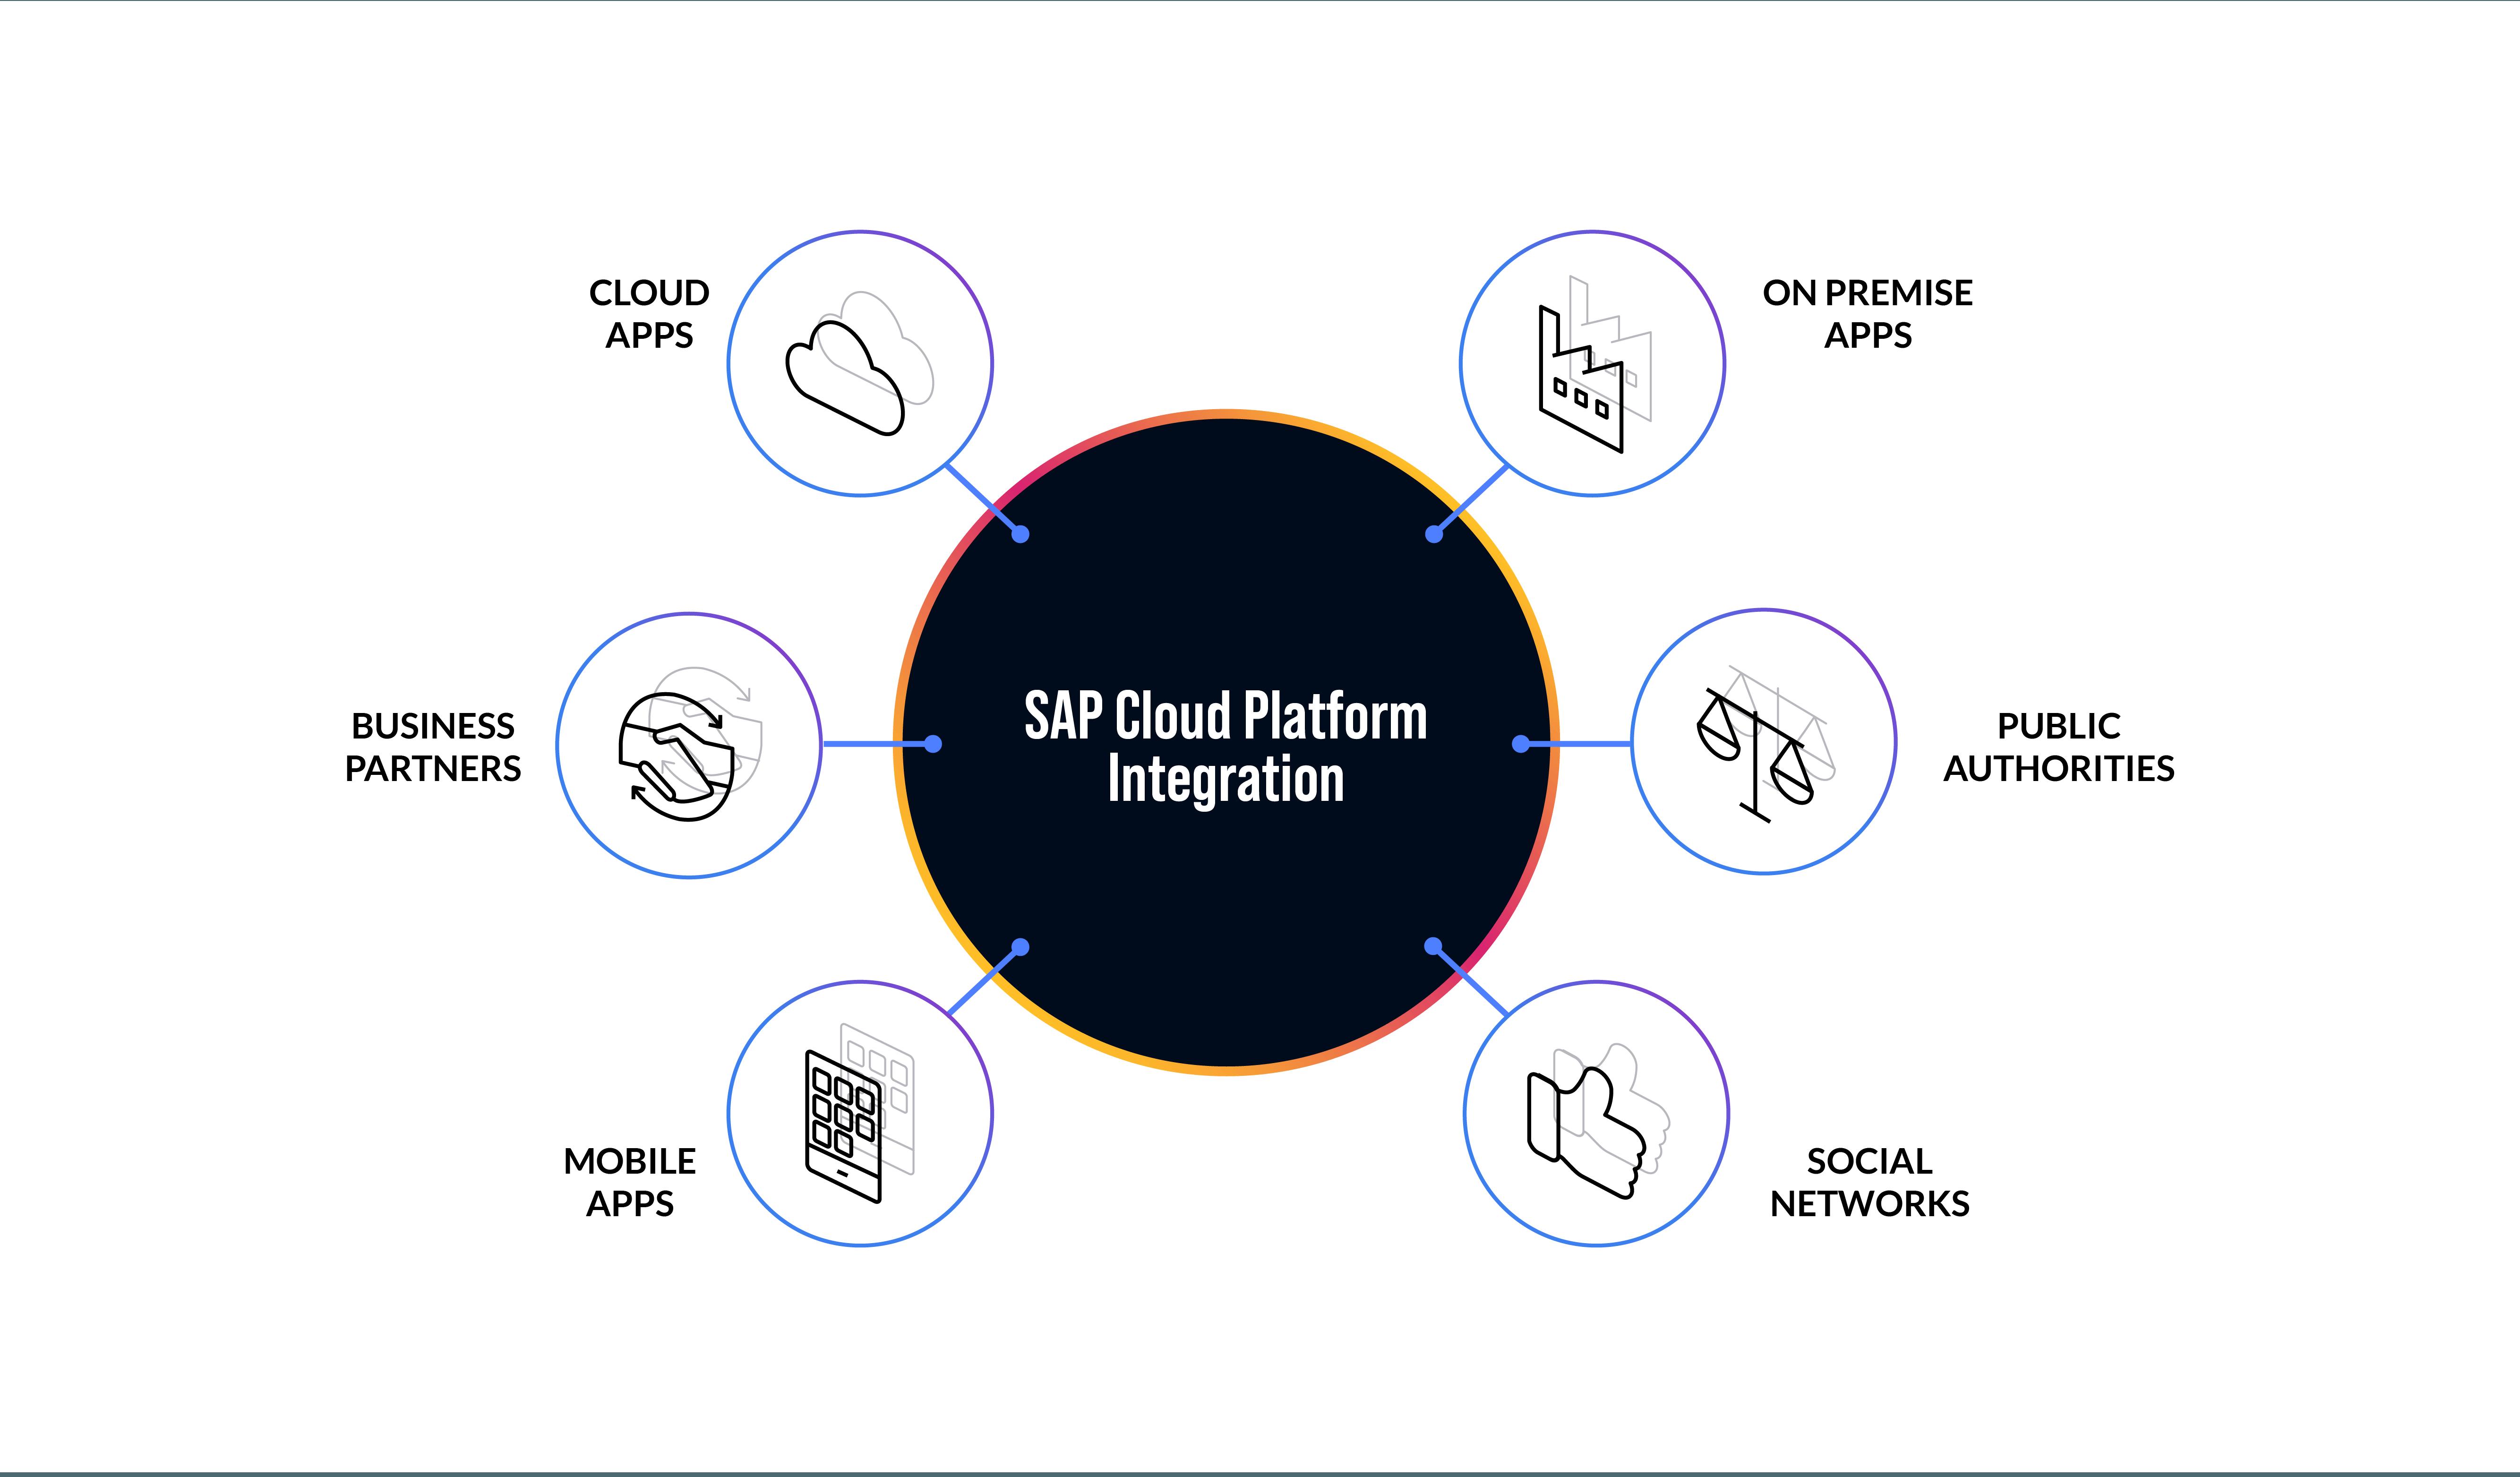 Building an Intelligent Enterprise Using SAP Cloud Platform Integration